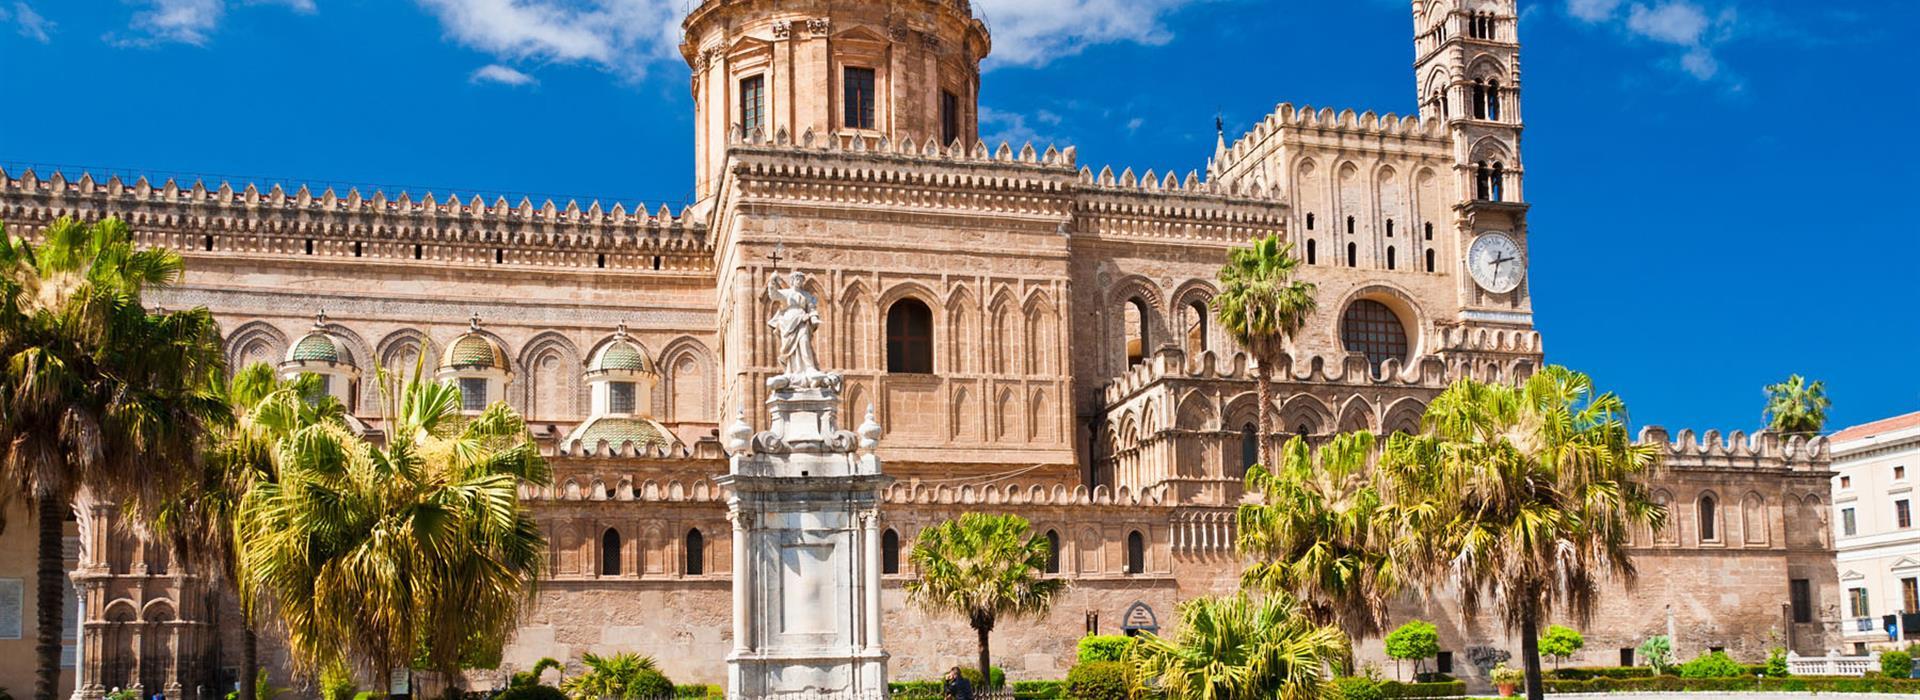 Italy-Sicily-Palermo_103380839